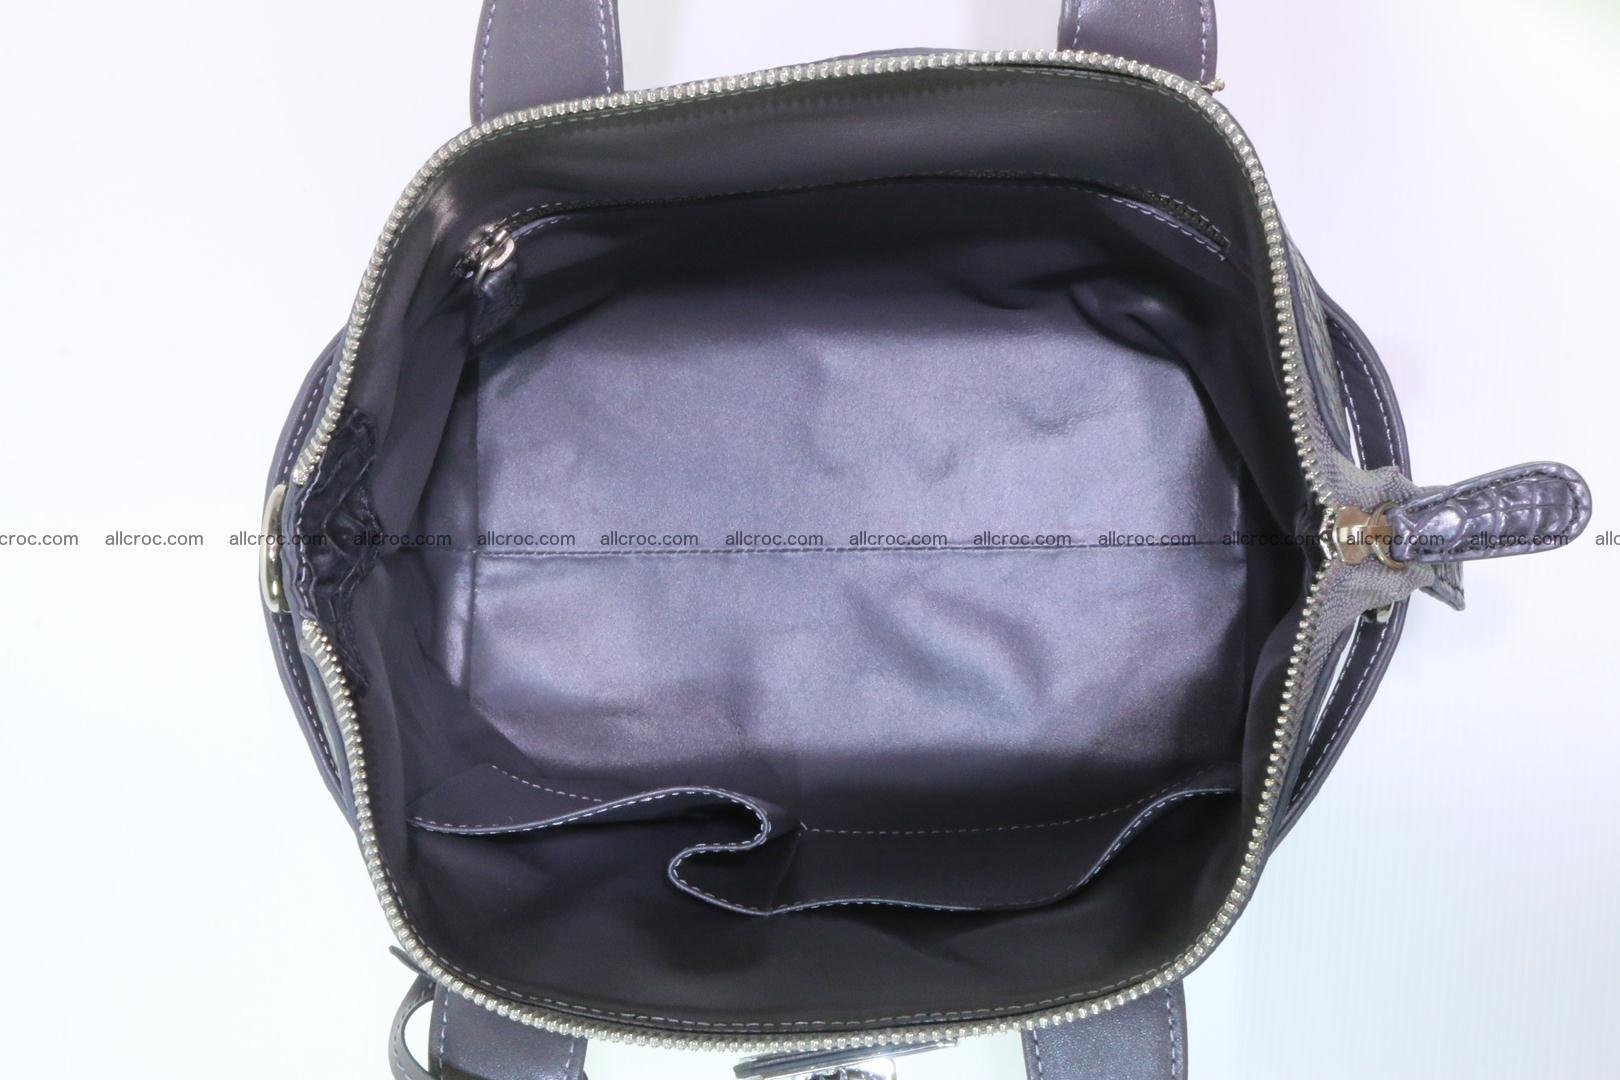 Genuine crocodile handbag for ladies 049 Foto 13